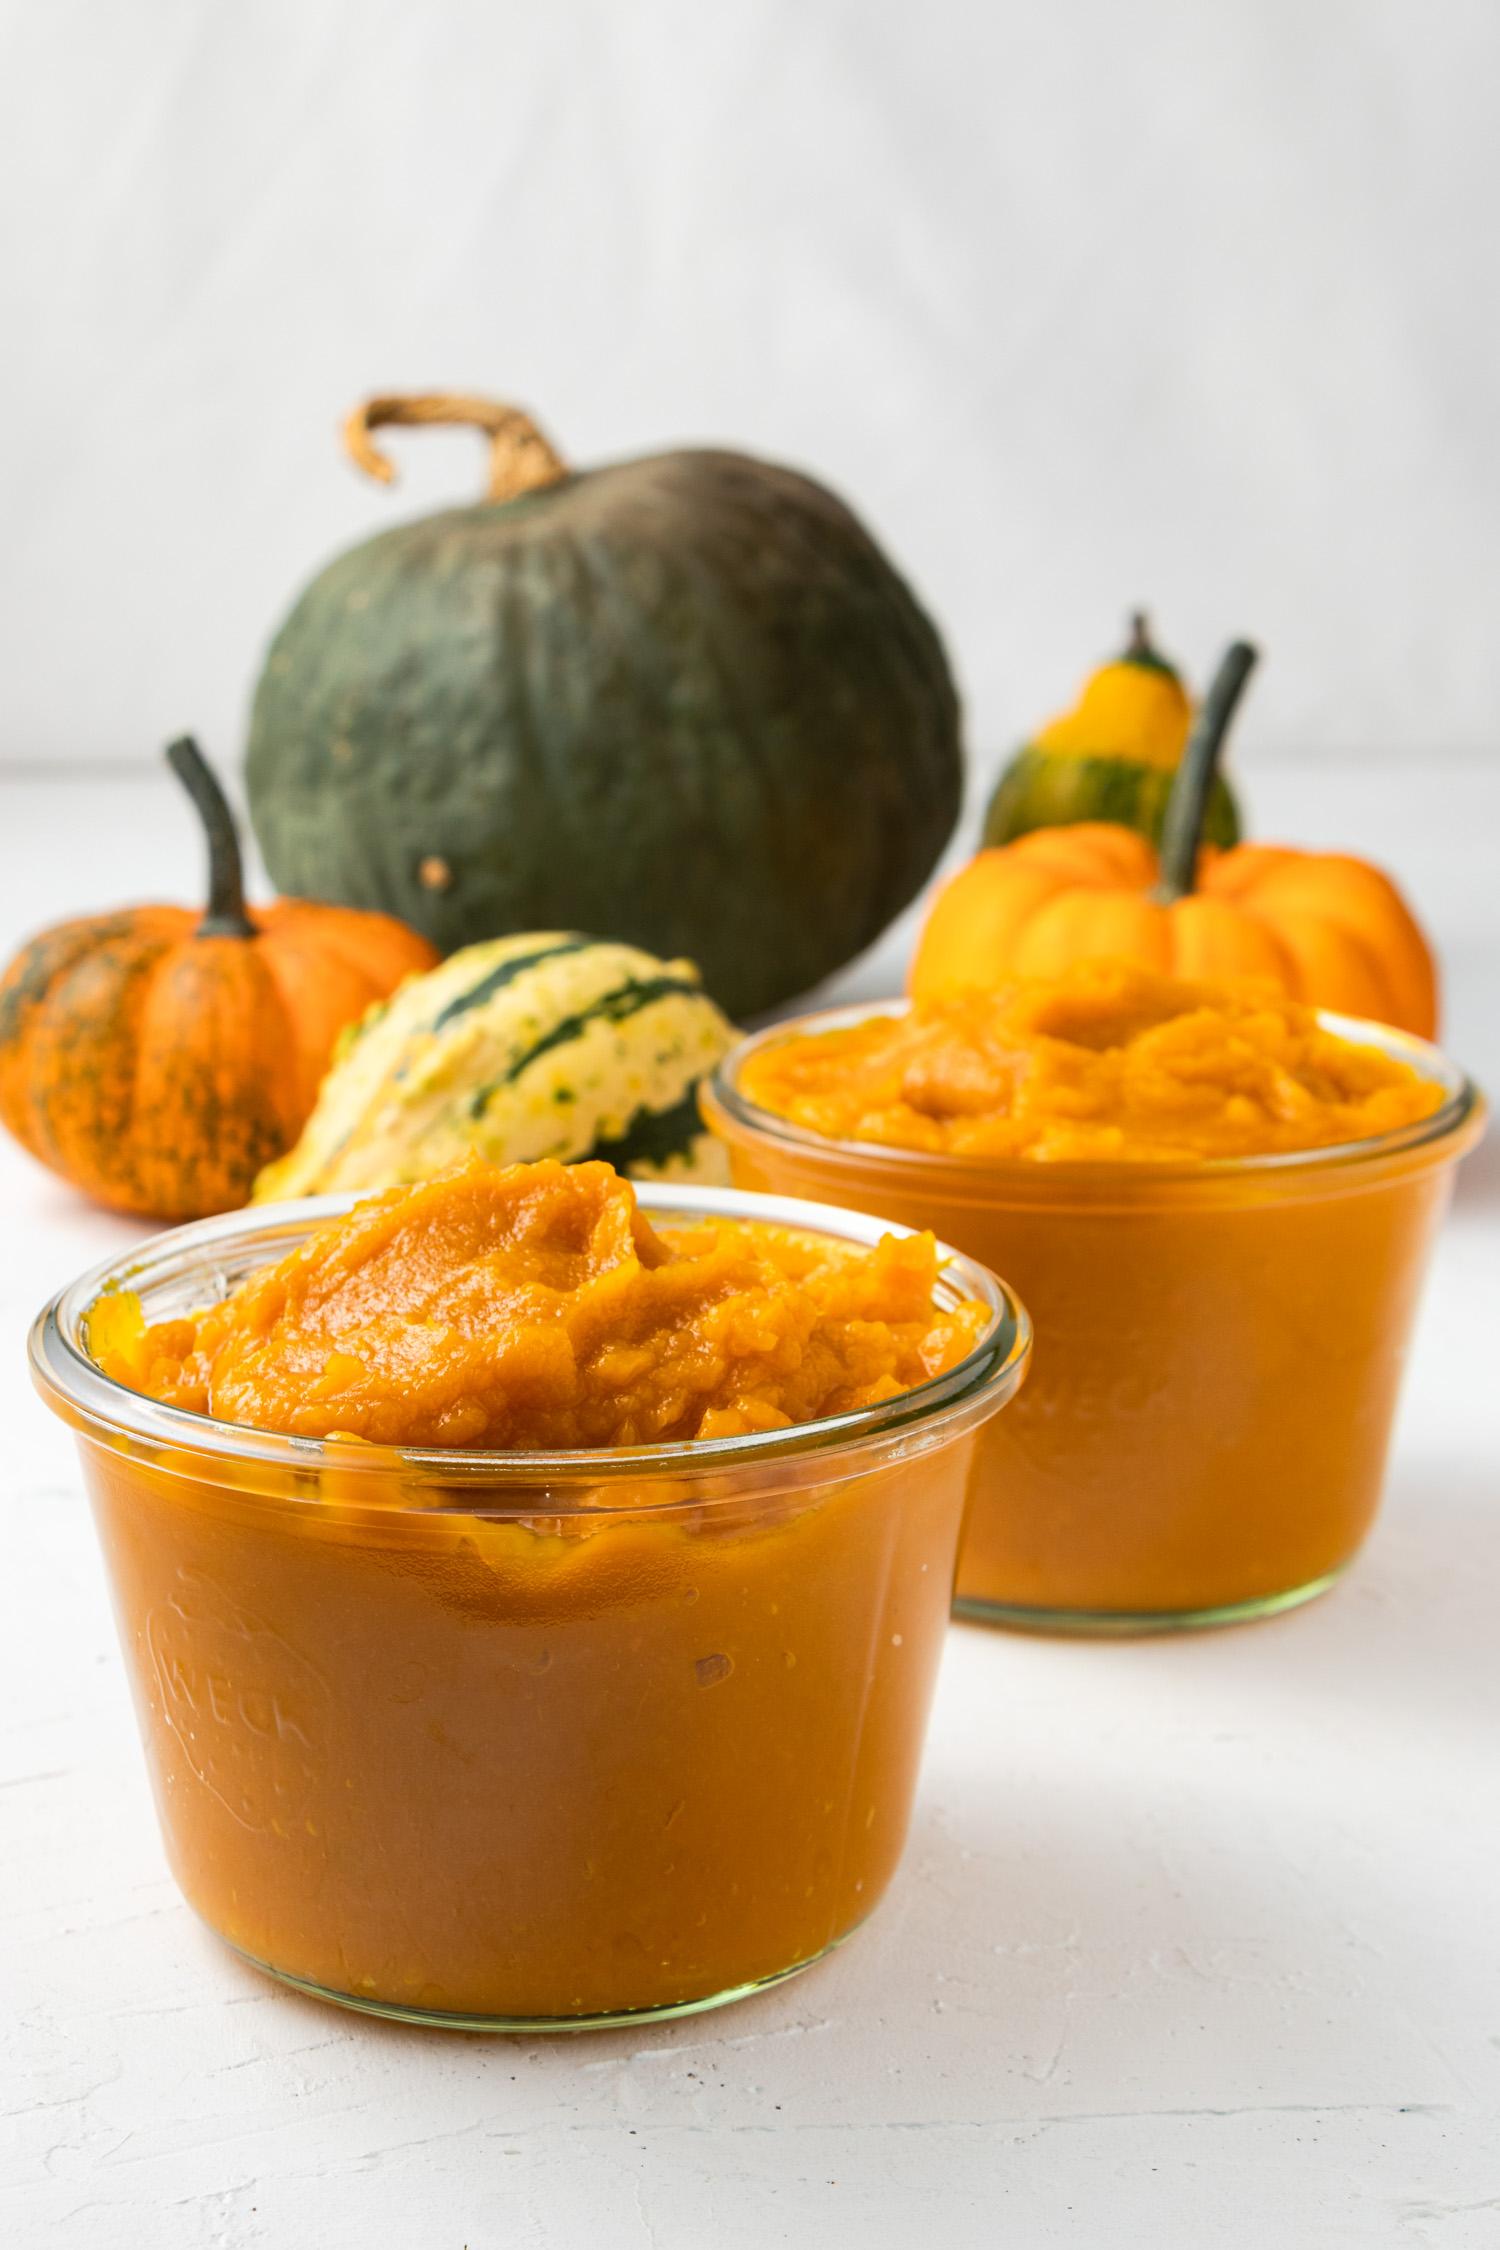 Low FODMAP Pumpkin Puree